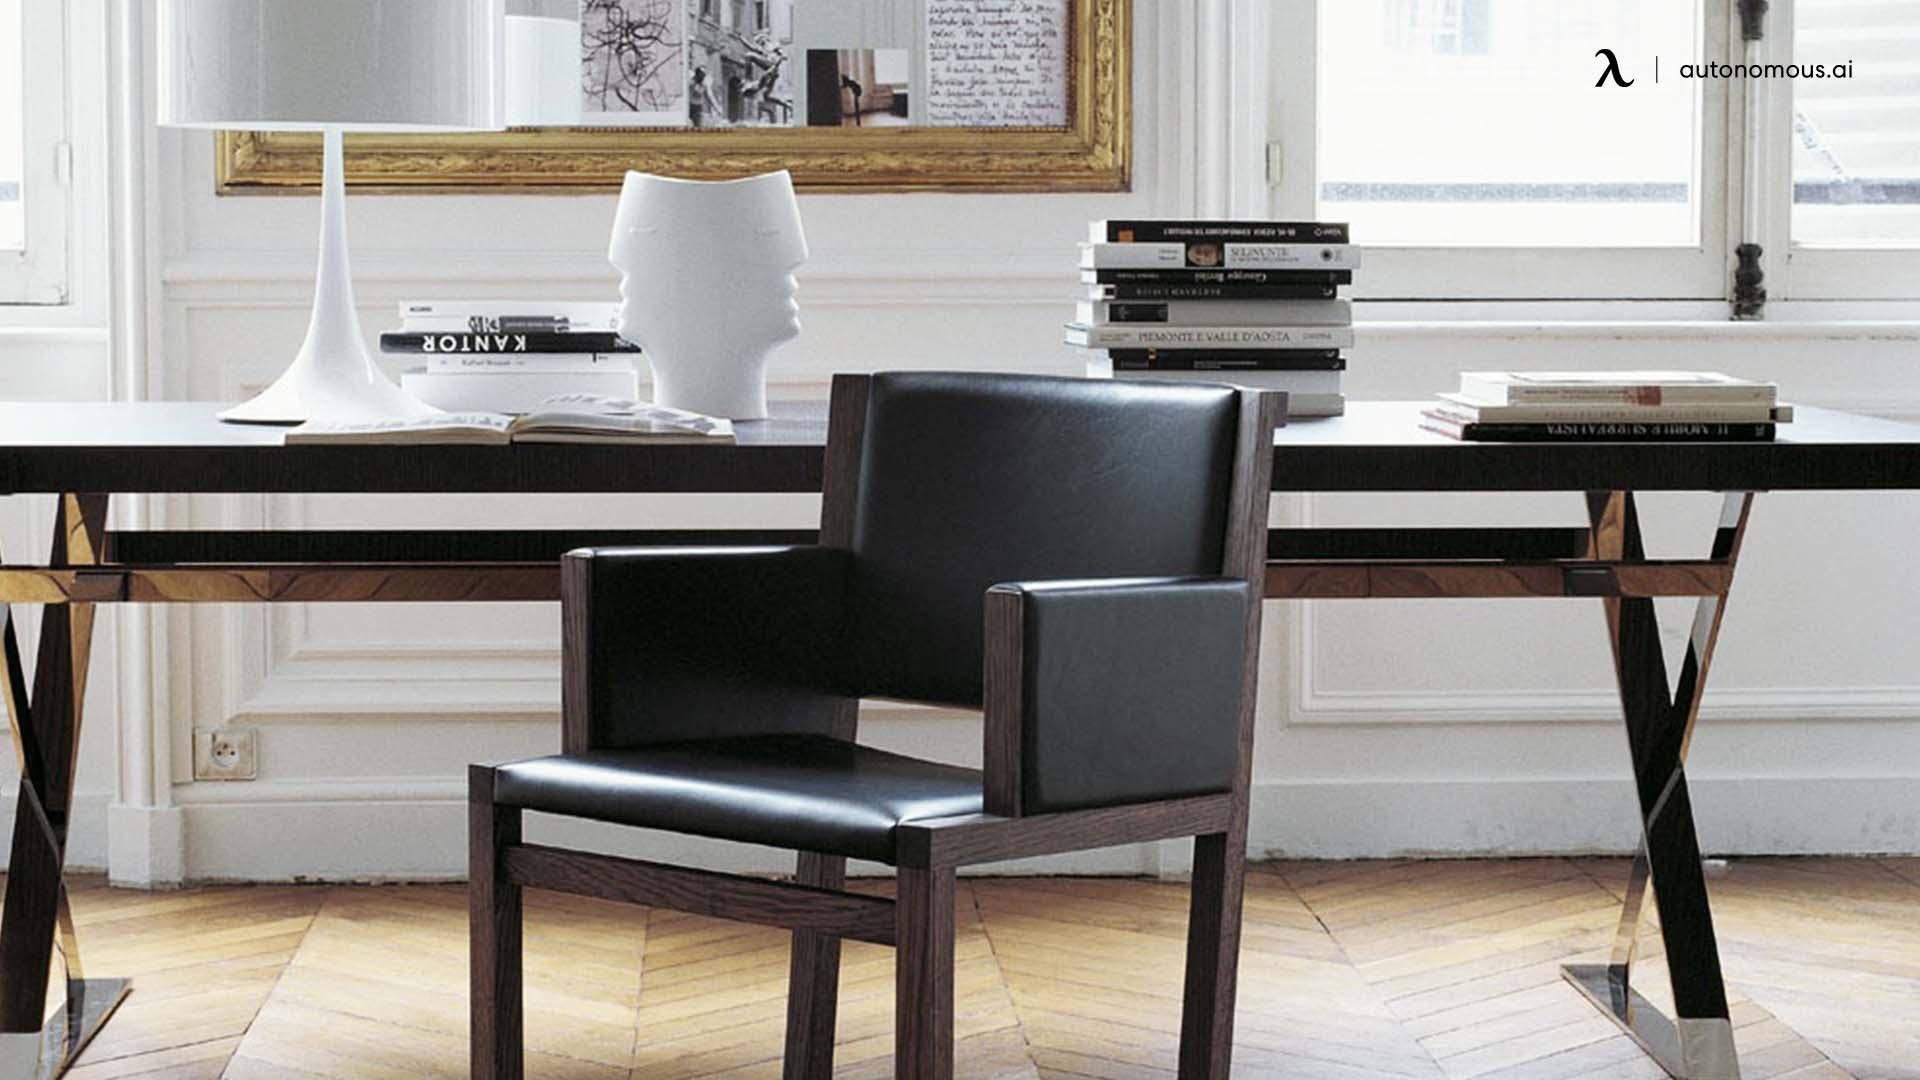 Recipio Desk by Antonio Citterio